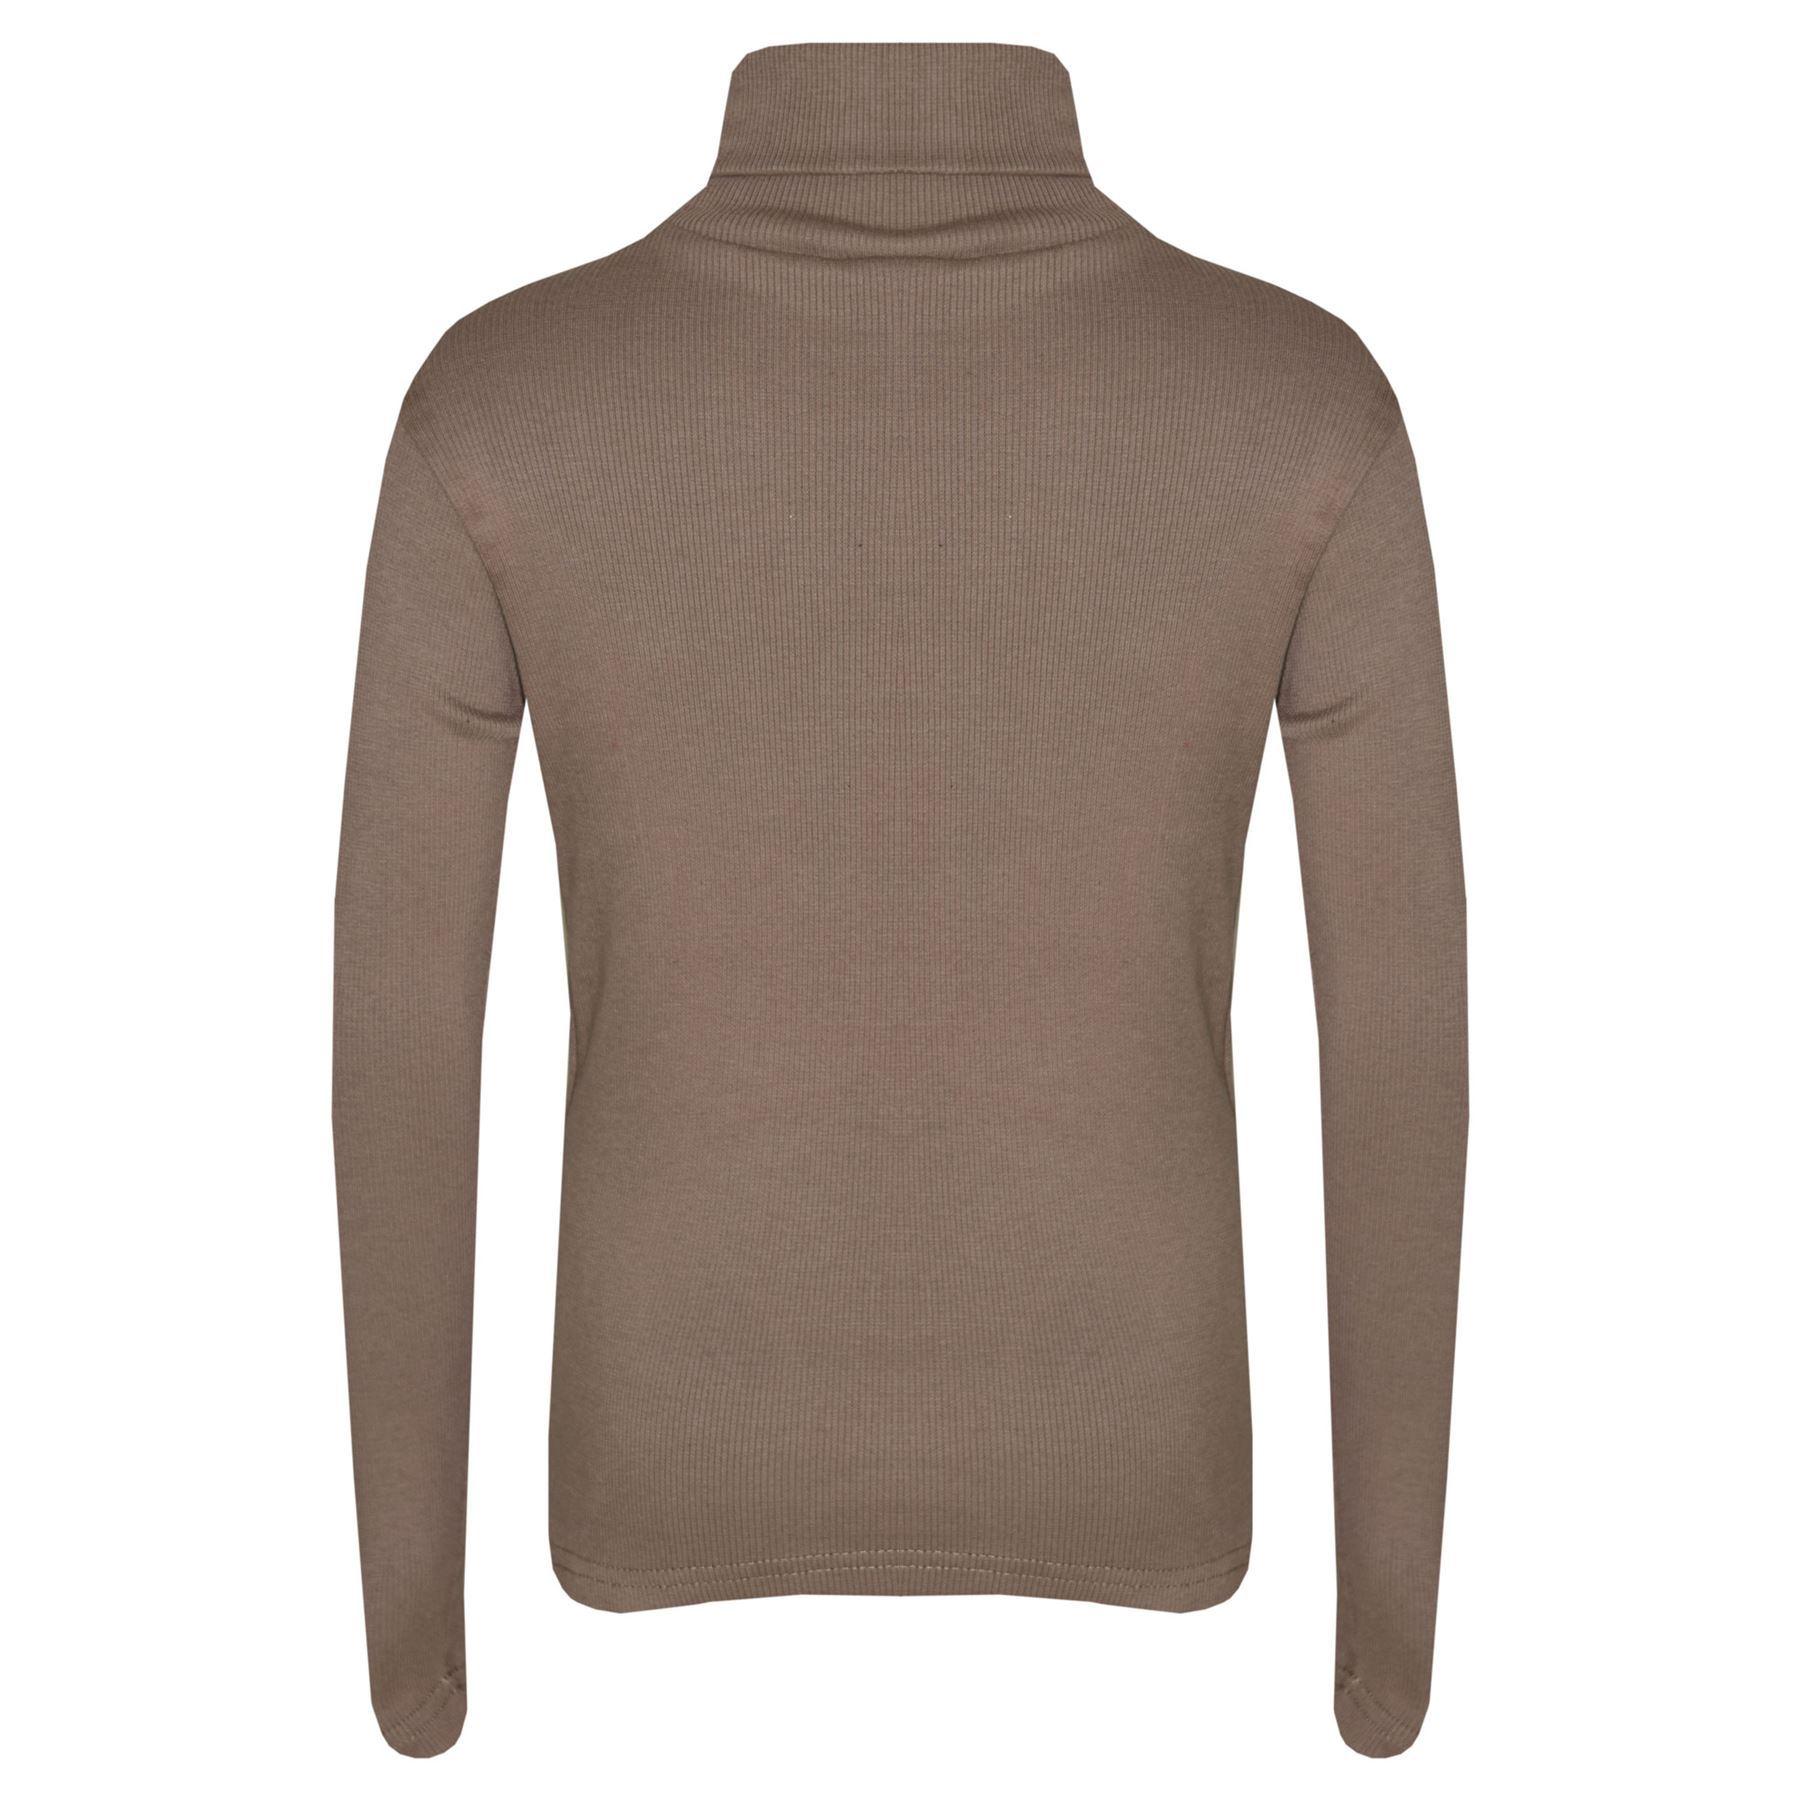 Kids Girls Polo Neck T Shirt Thick Cotton Turtleneck Jumper Long Sleeve Top